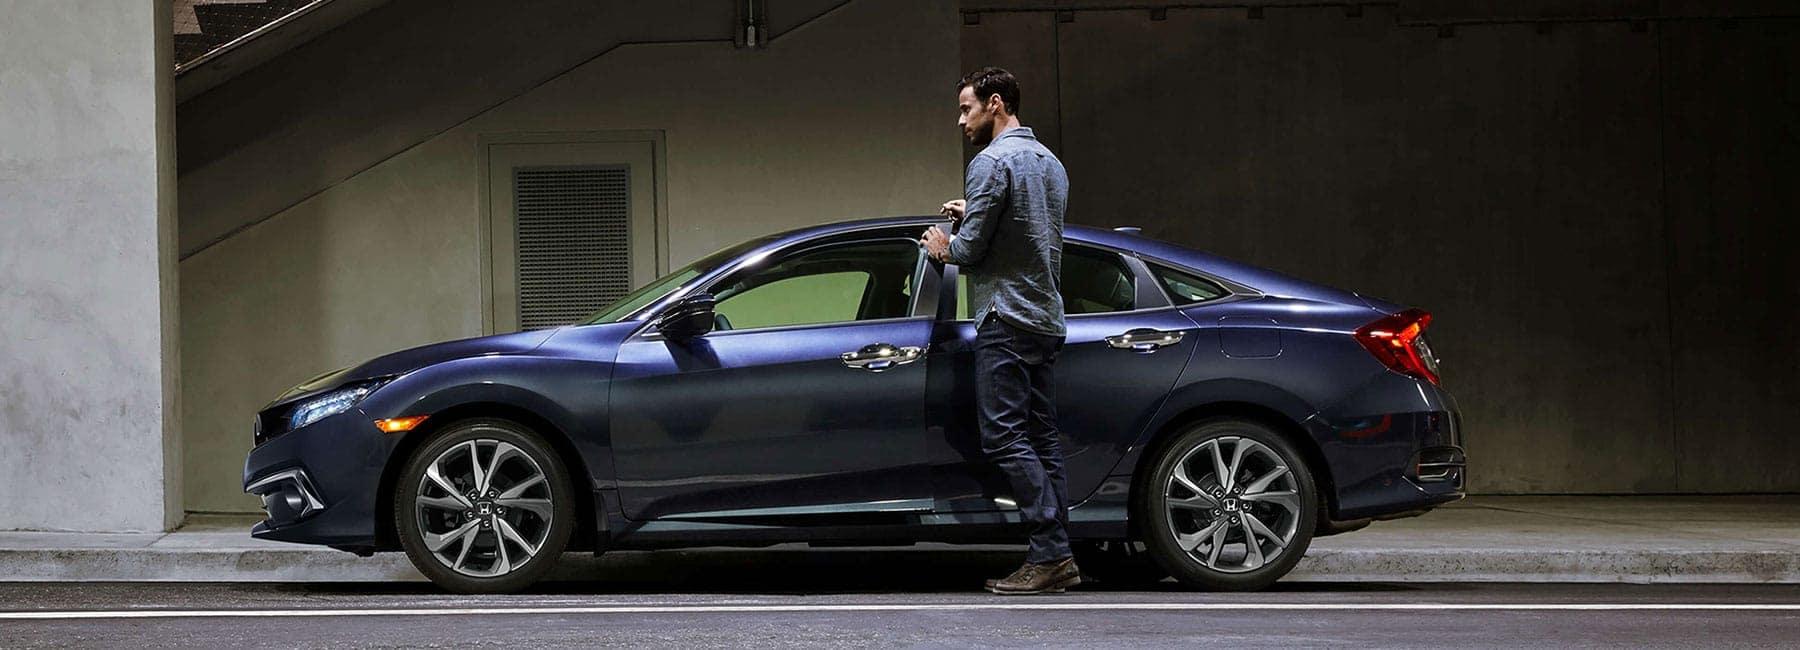 man opens driver door of Honda Civic sedan